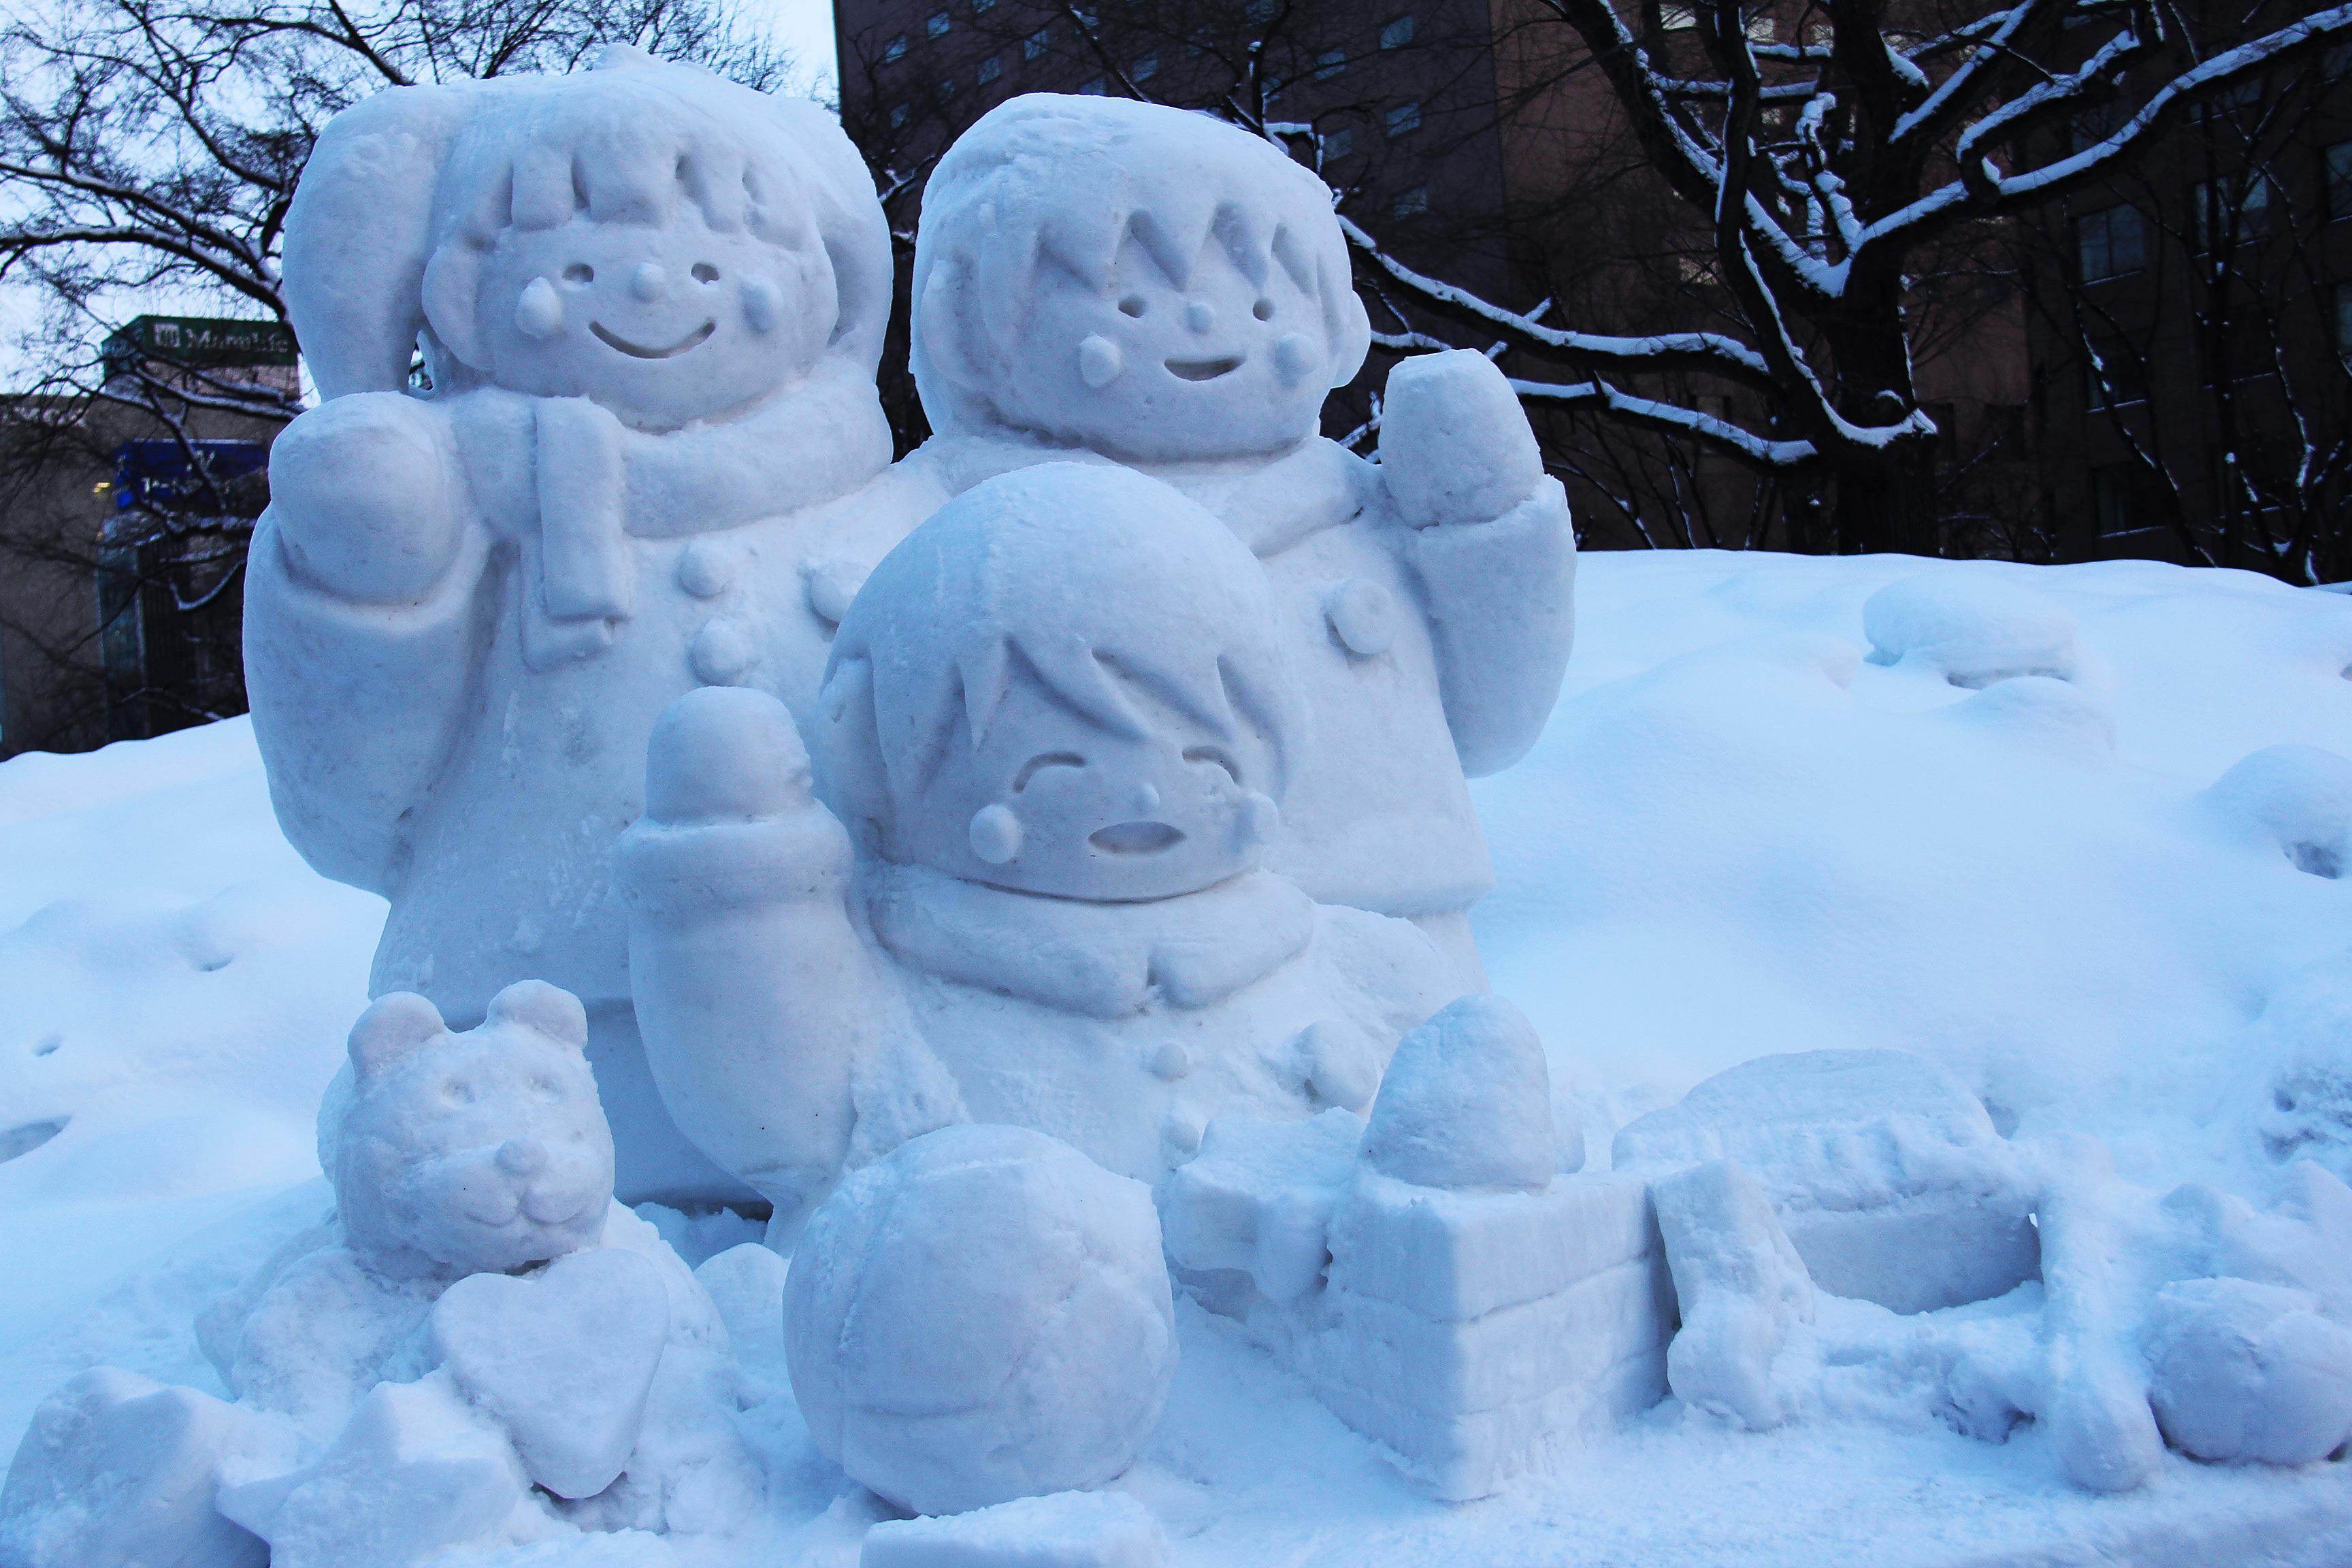 Gambar Musim Dingin Putih Es Cuaca Jepang Patung Festival